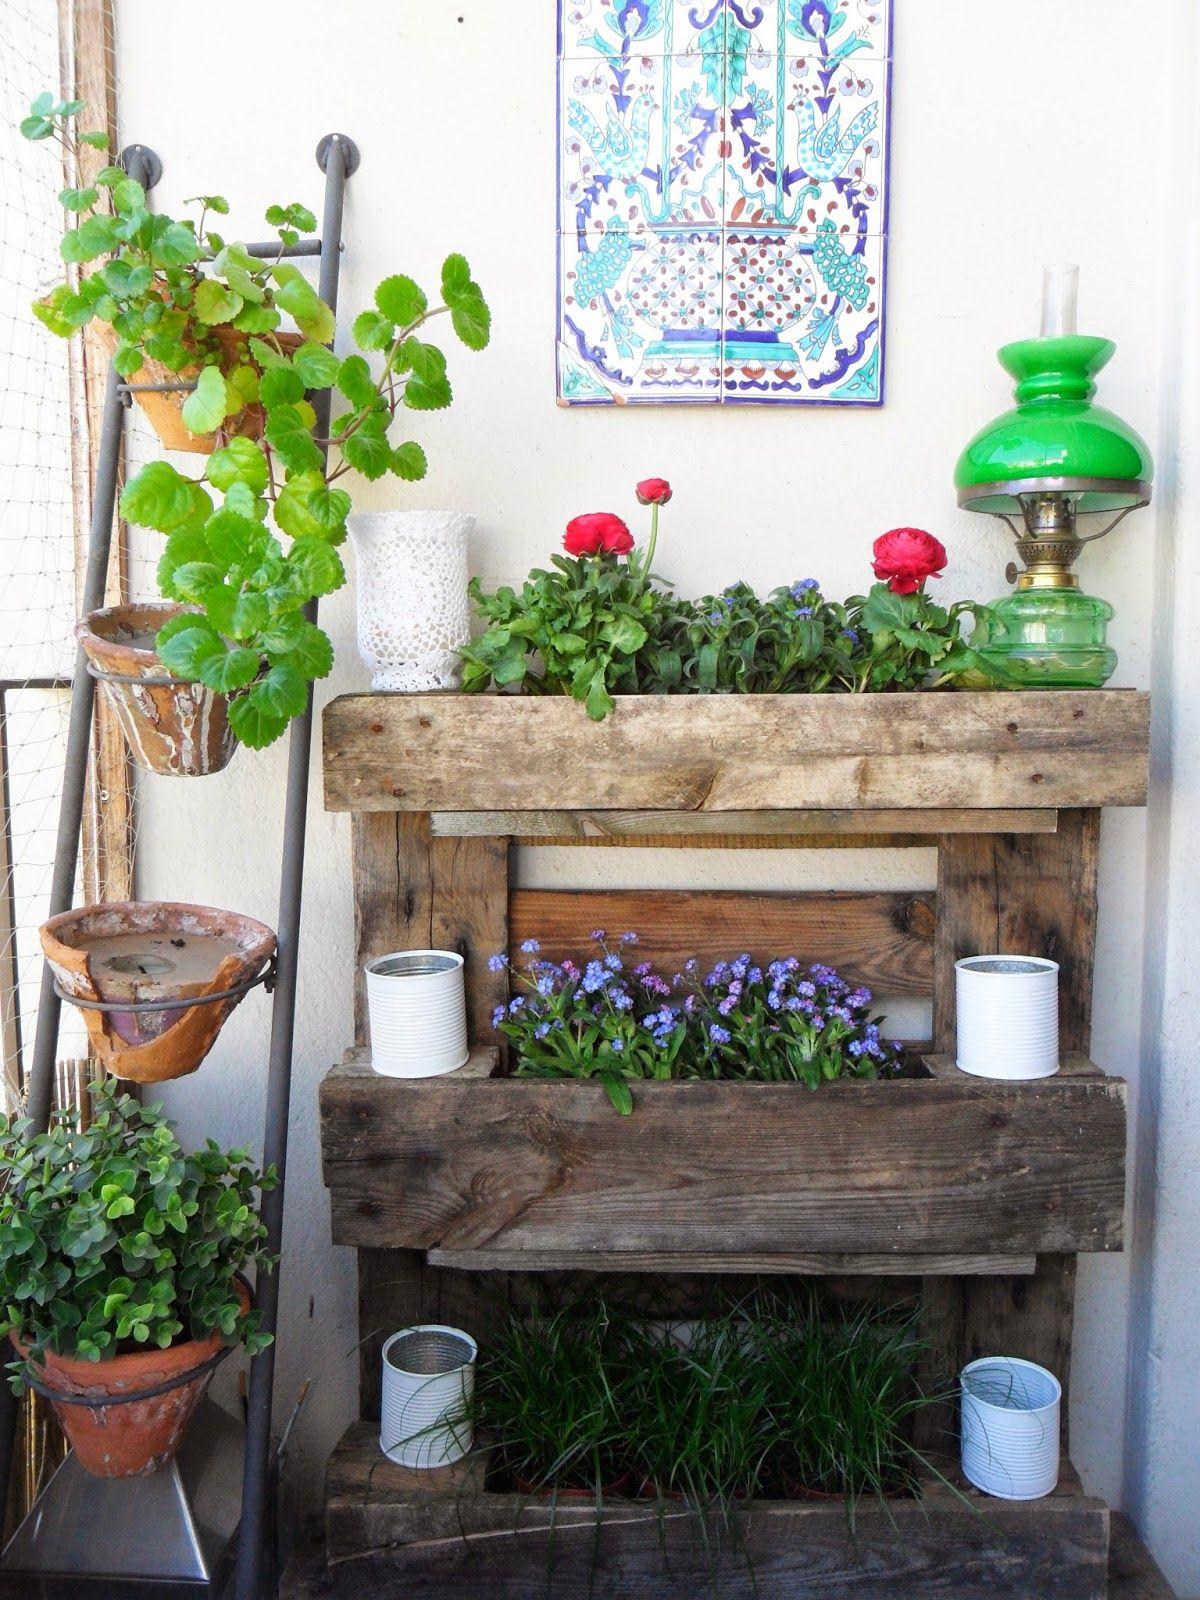 nur noch: balkongarten - wall garden for my balcony | the useful